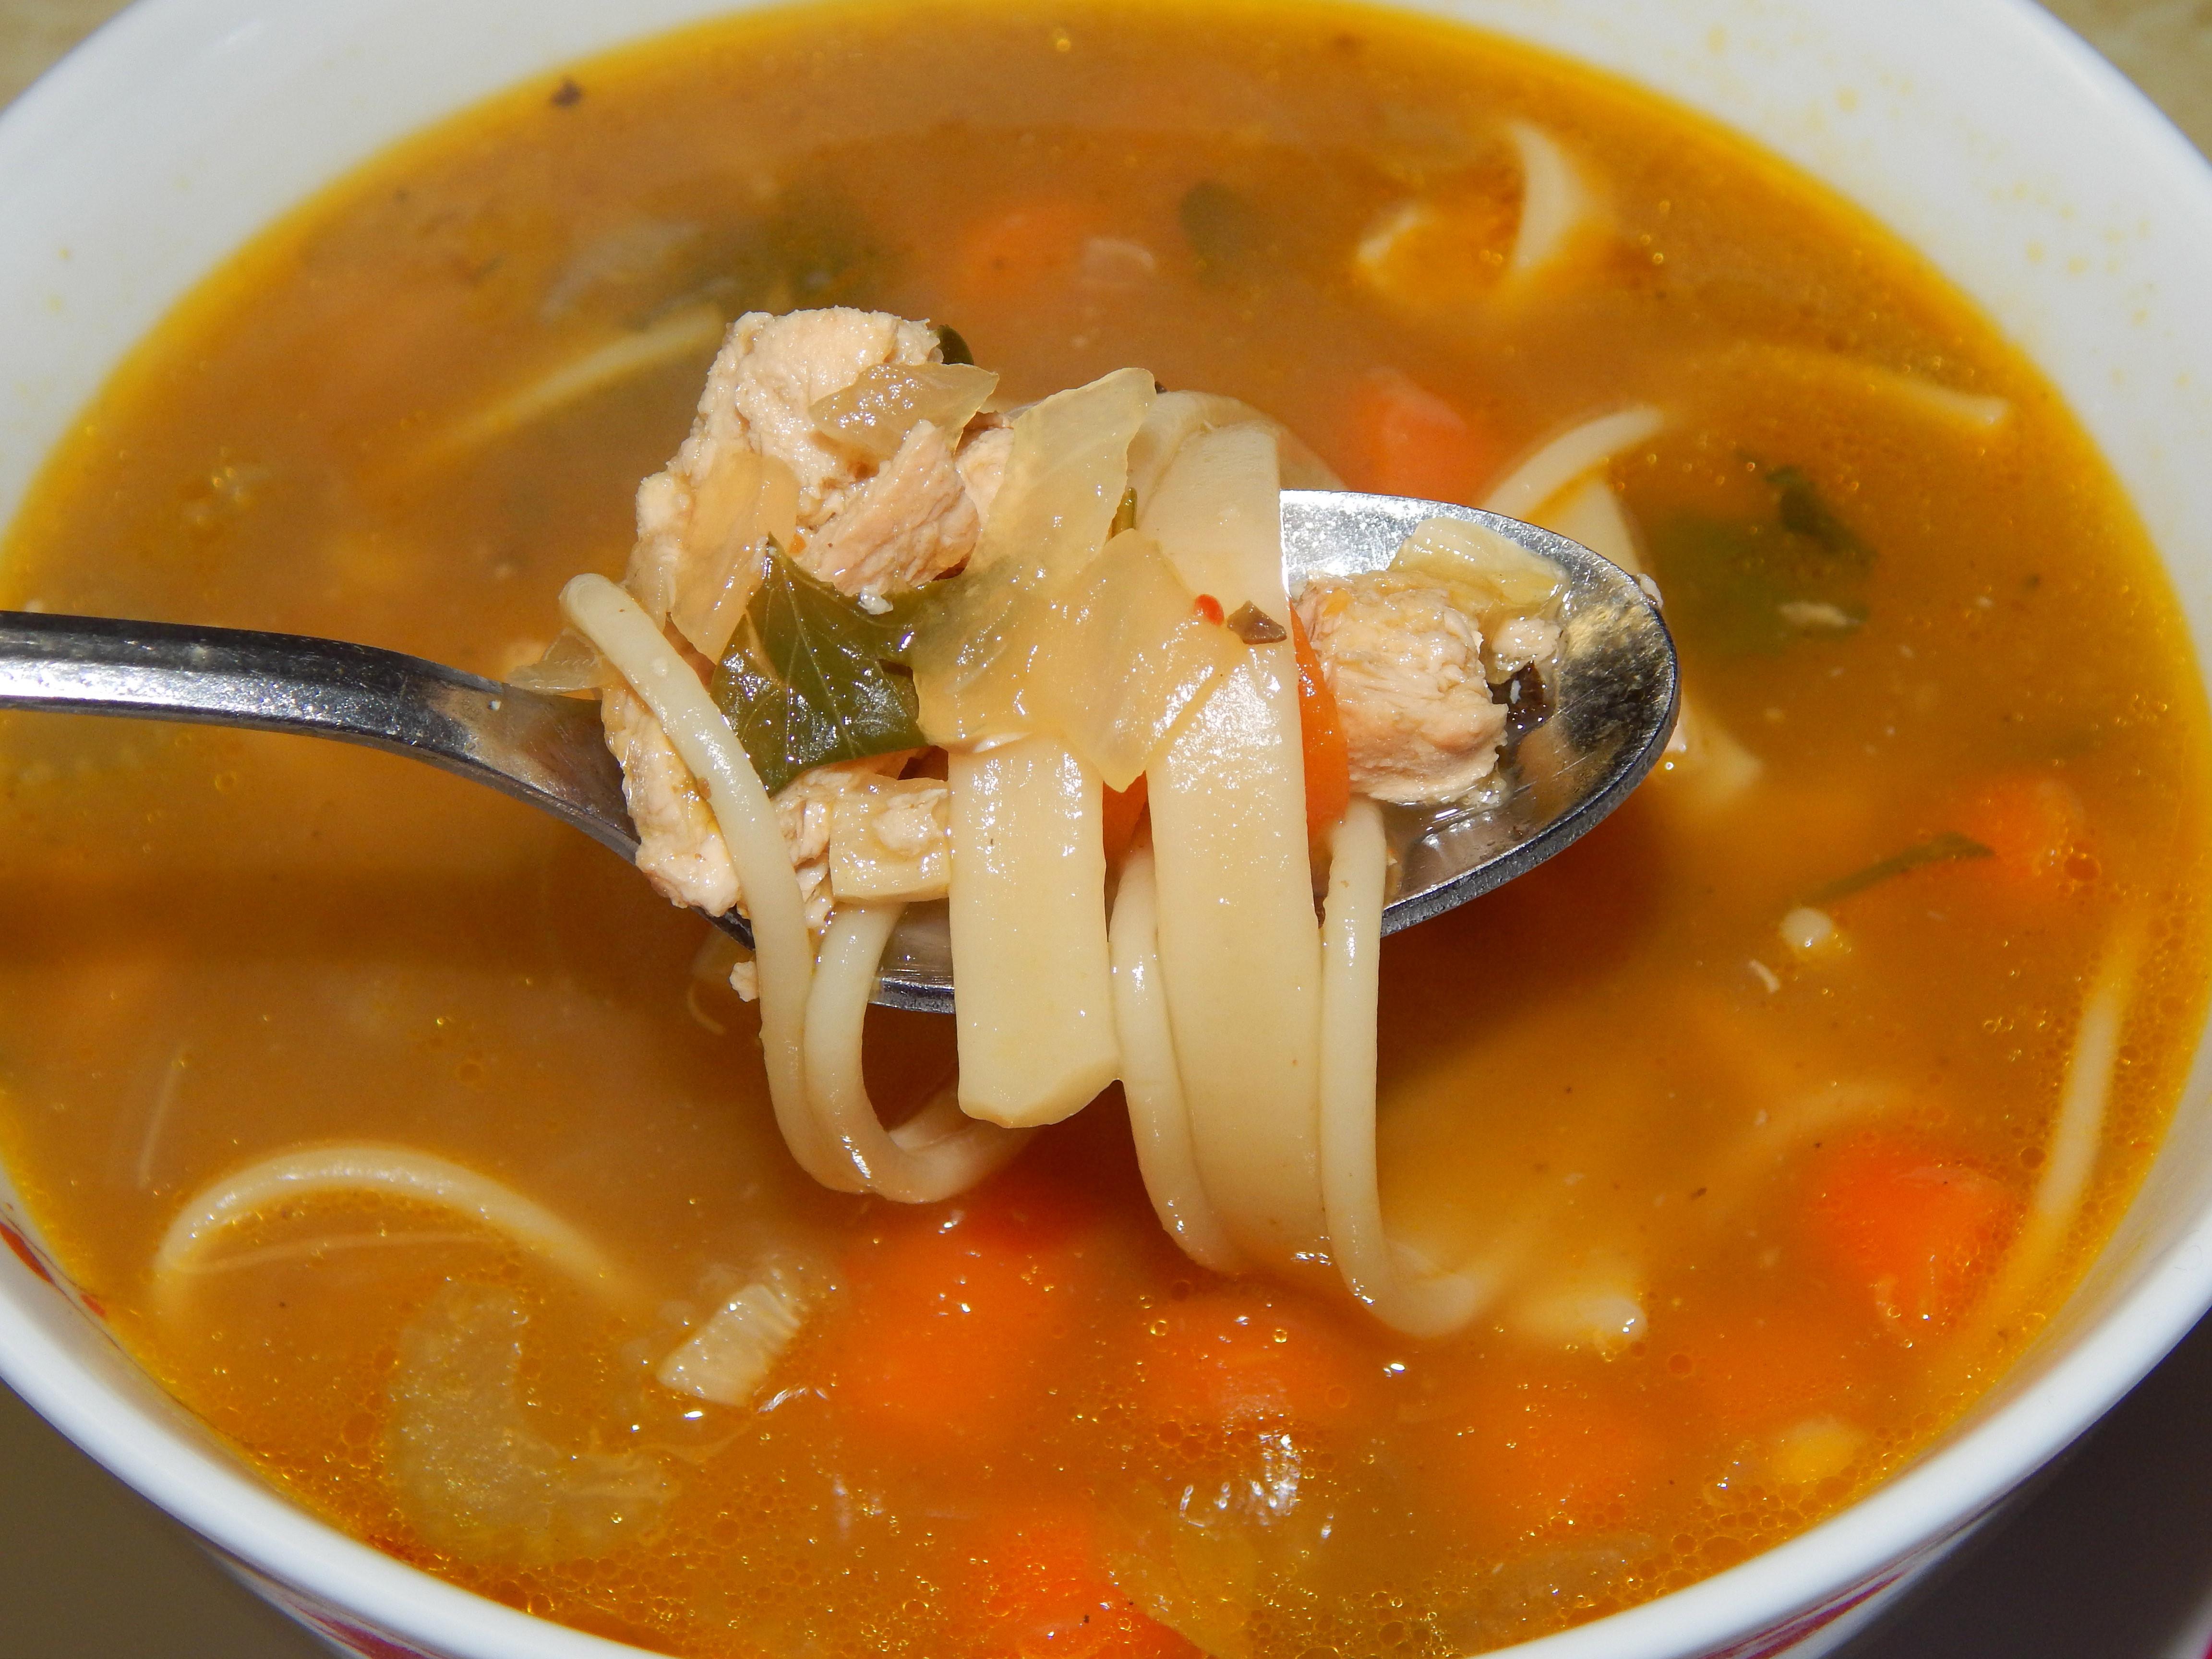 Chicken Noodle Soup For The Soul  Chicken Noodle Soup For The Vegan Soul – VegCharlotte